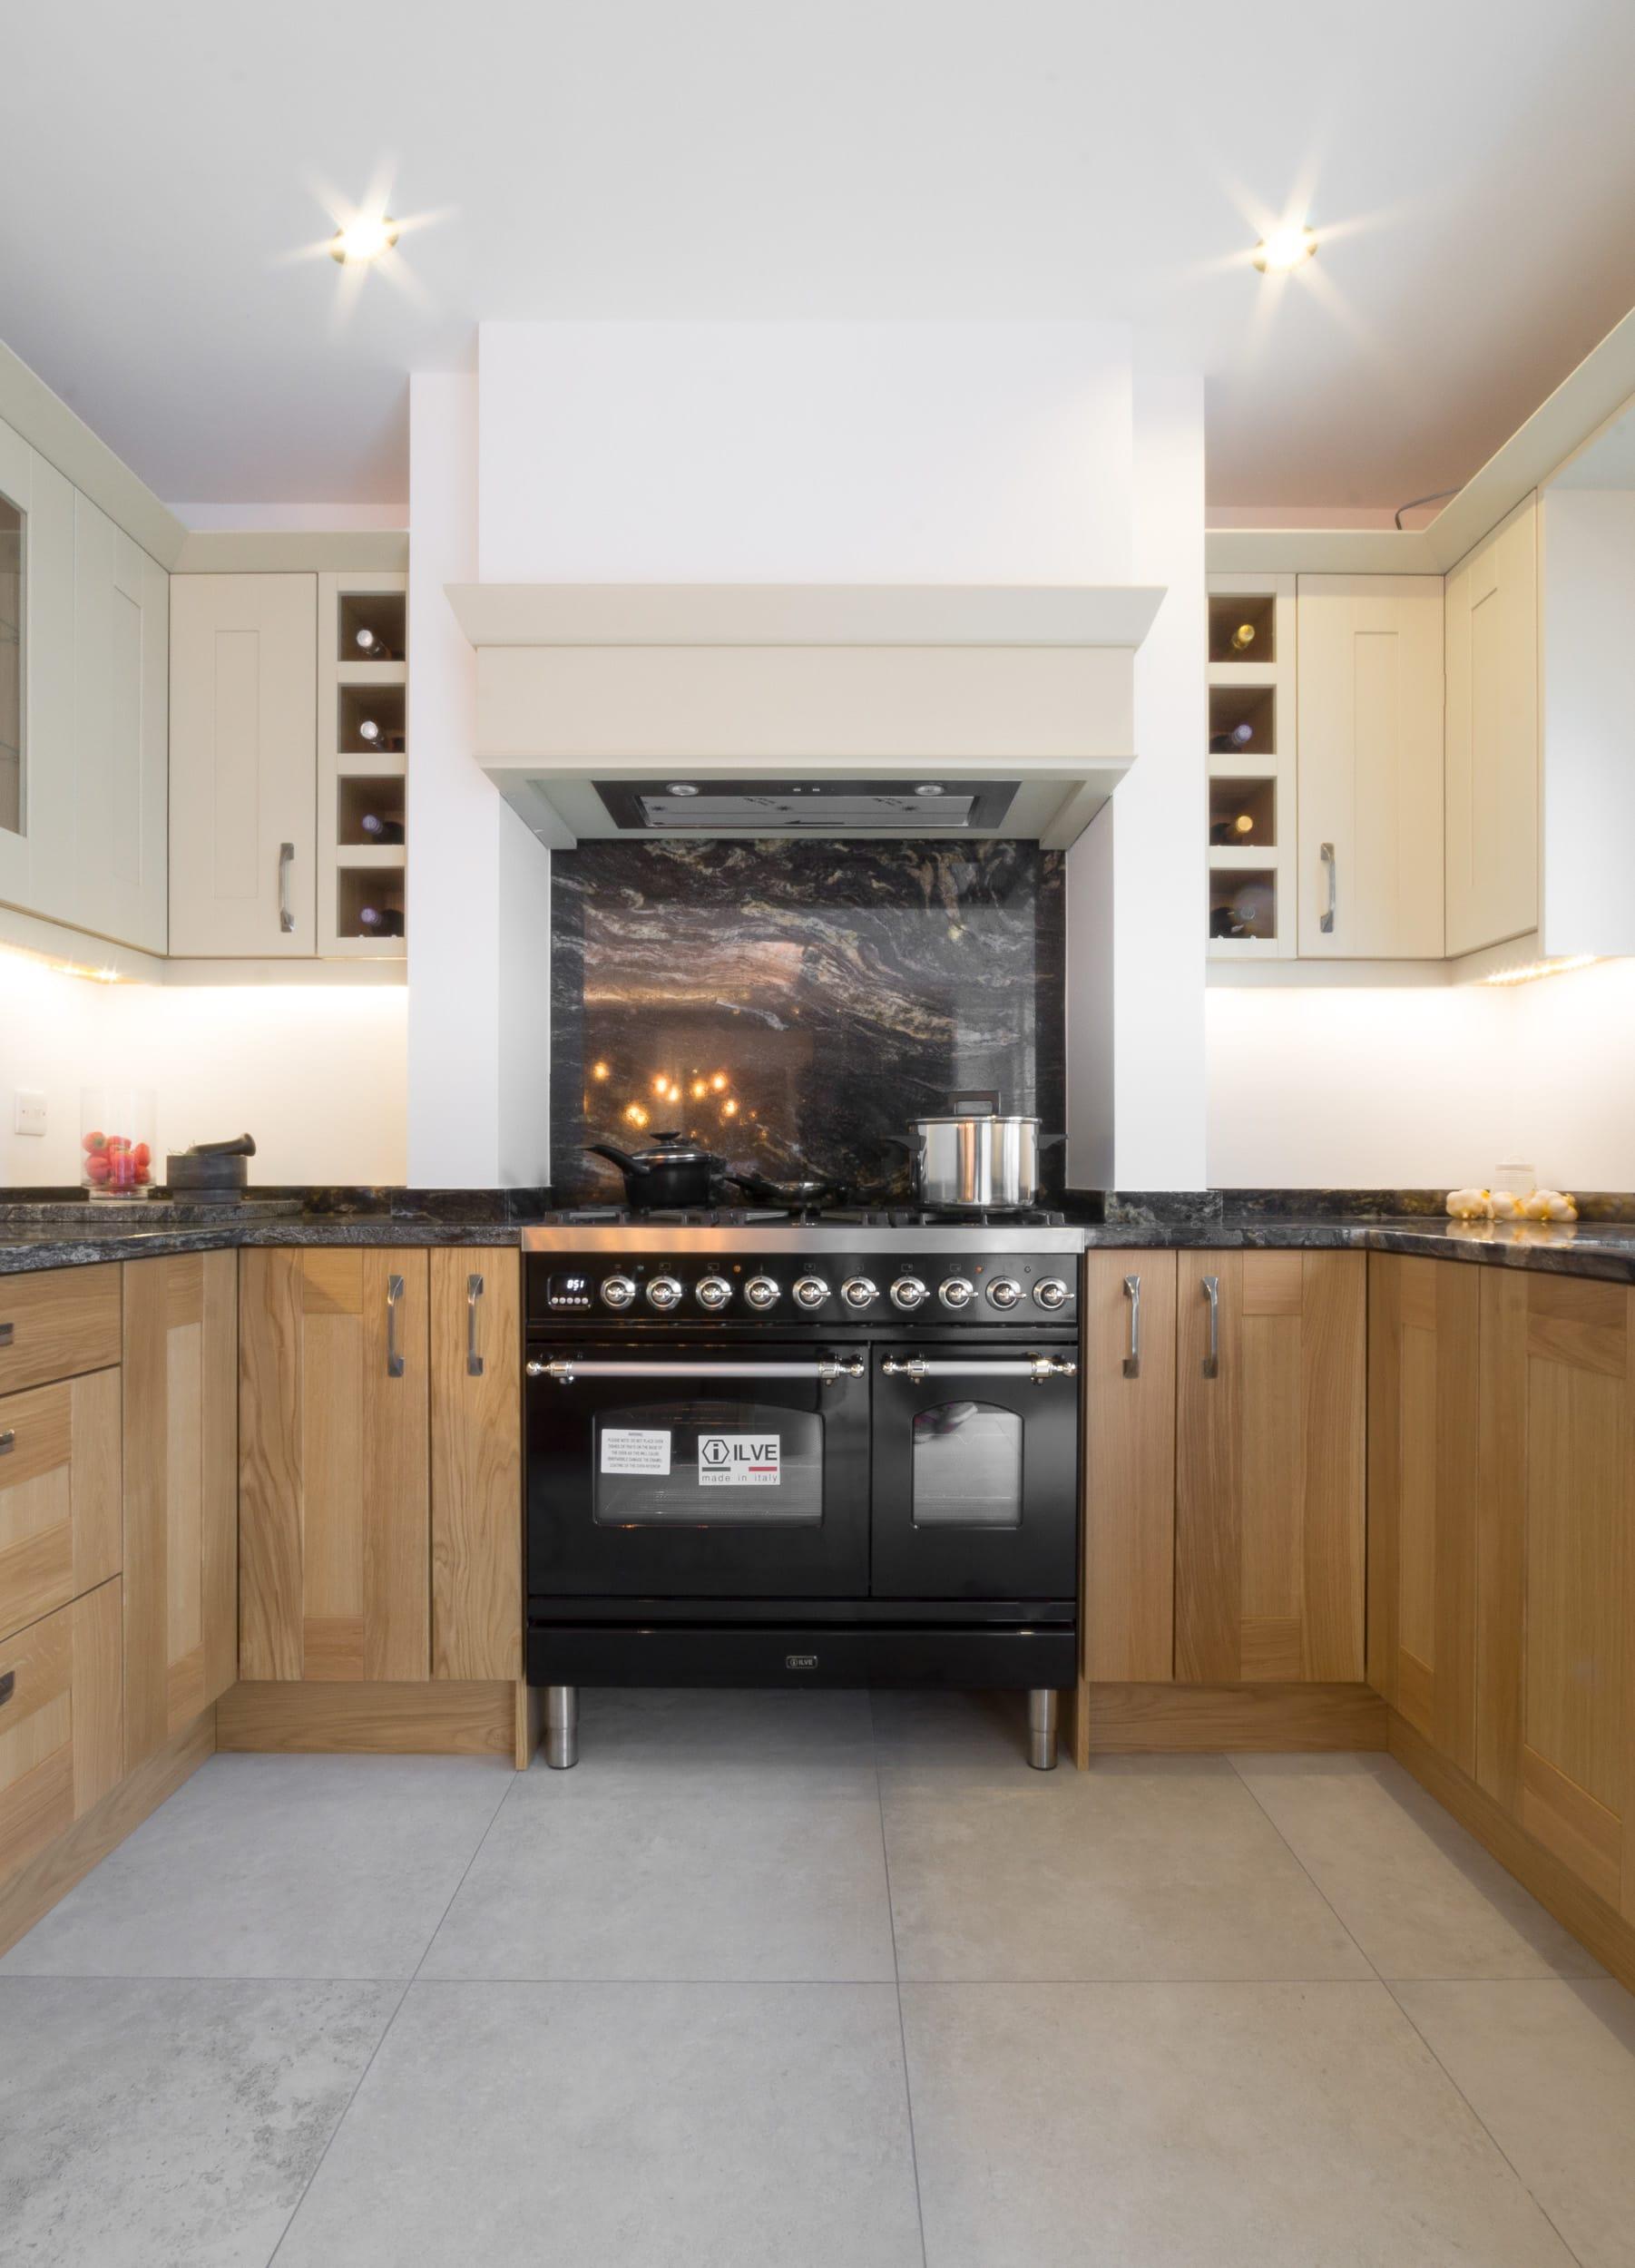 Kitchen-Showroom-Webbs-Kendal-33.jpg